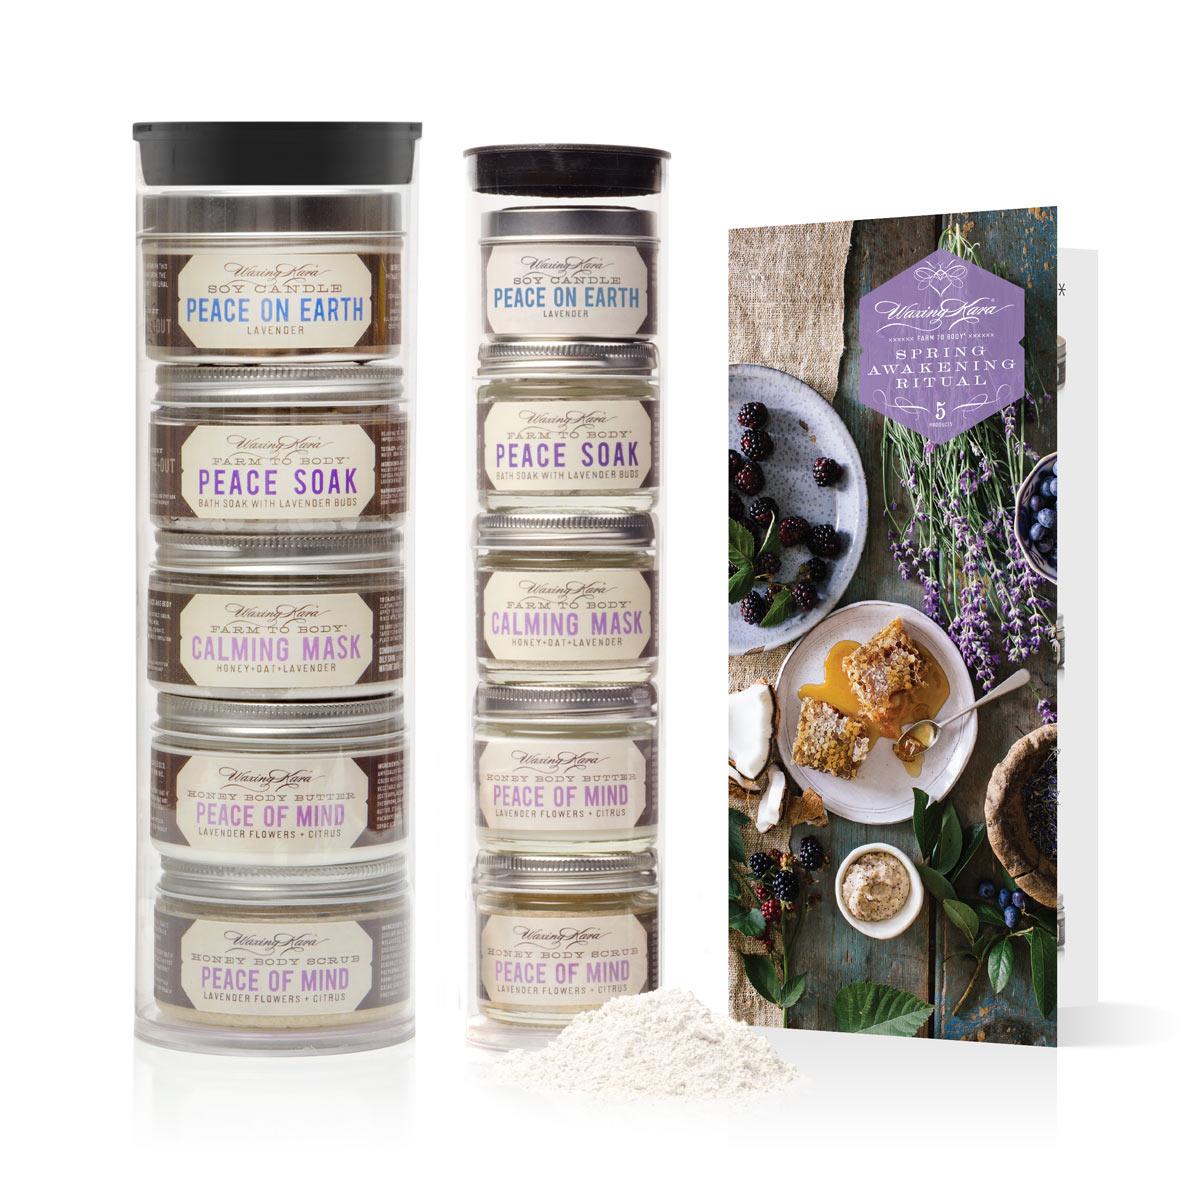 Waxing Kara Raw Honey Beauty And Skincare Products